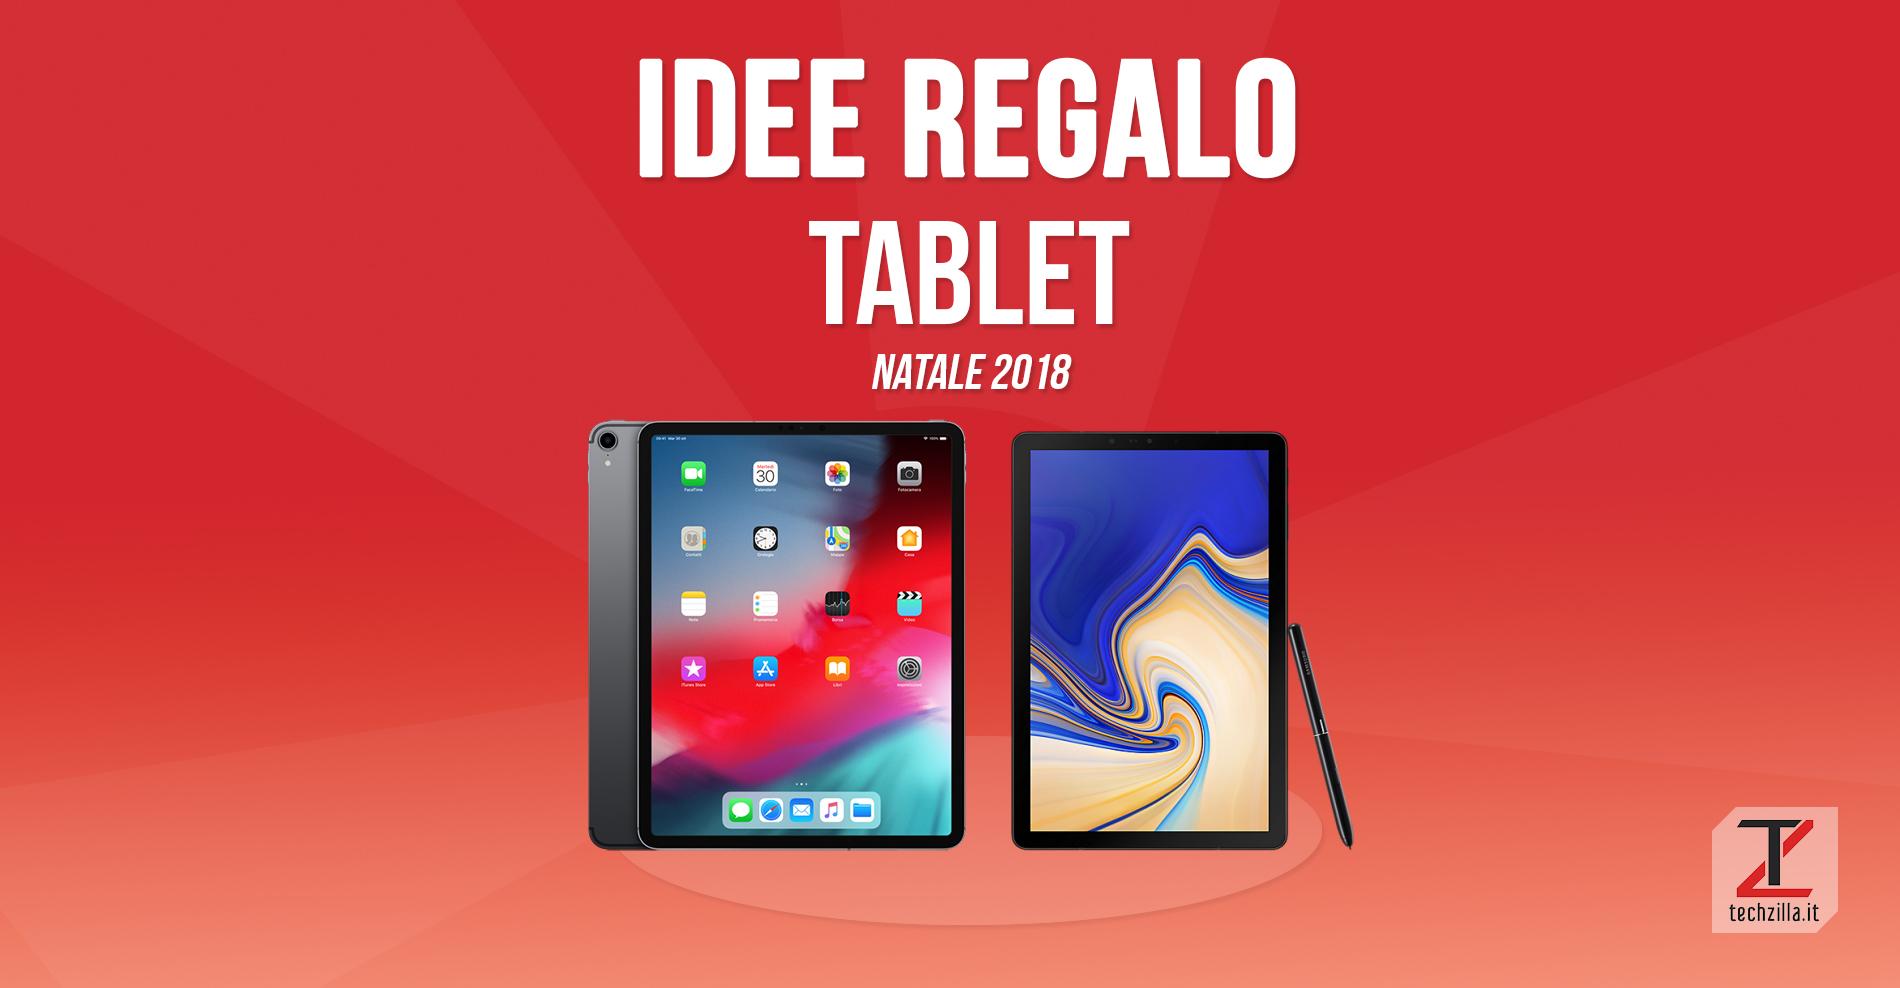 Idee regali tecnologici Natale 2018 tablet